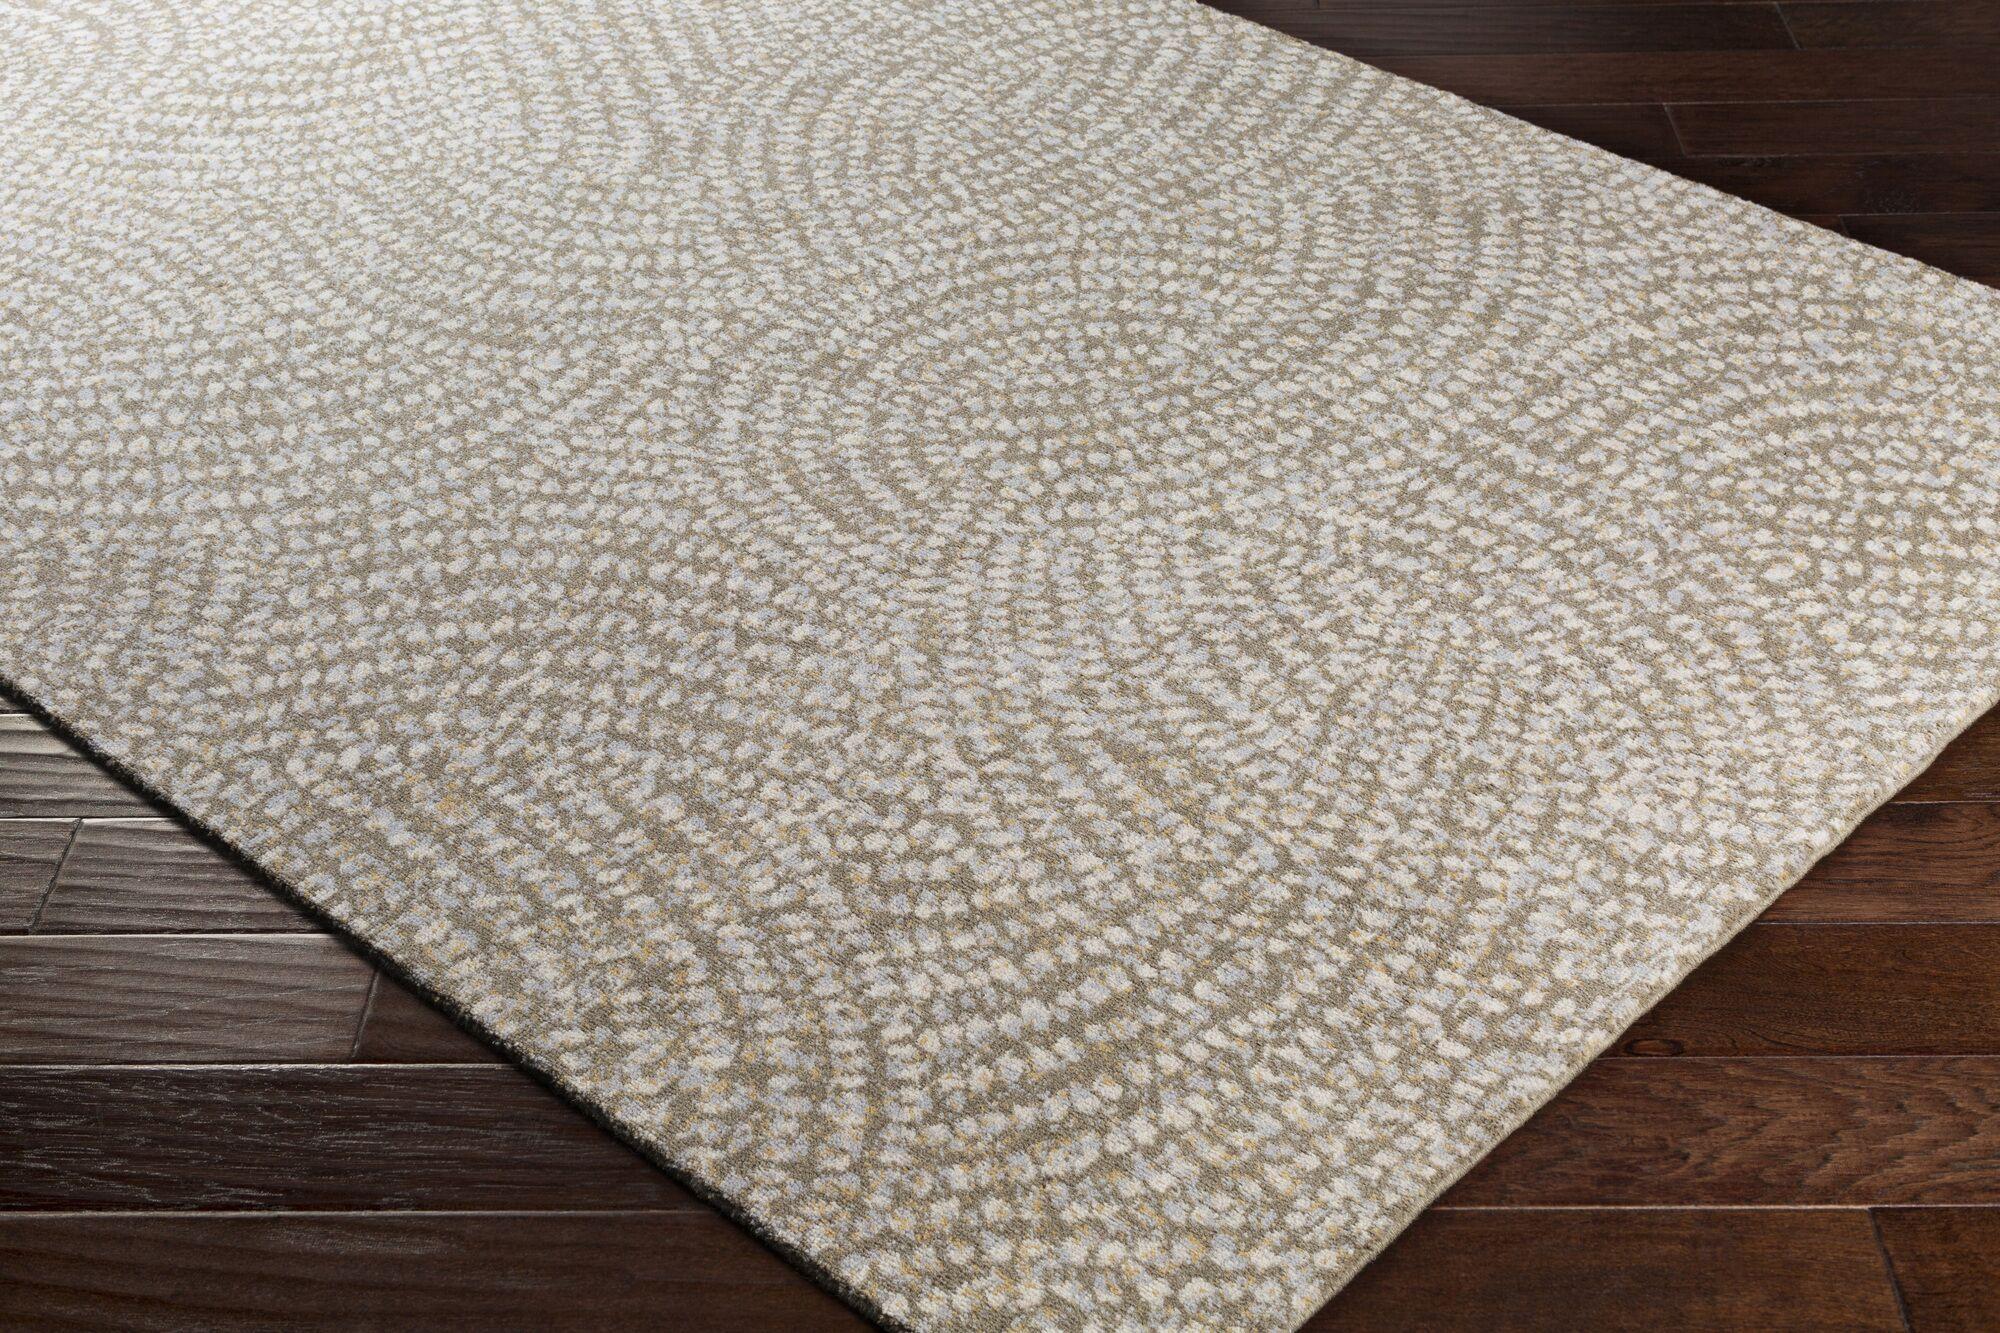 Seydou Modern Wool Camel Area Rug Rug Size: Rectangle 3'6